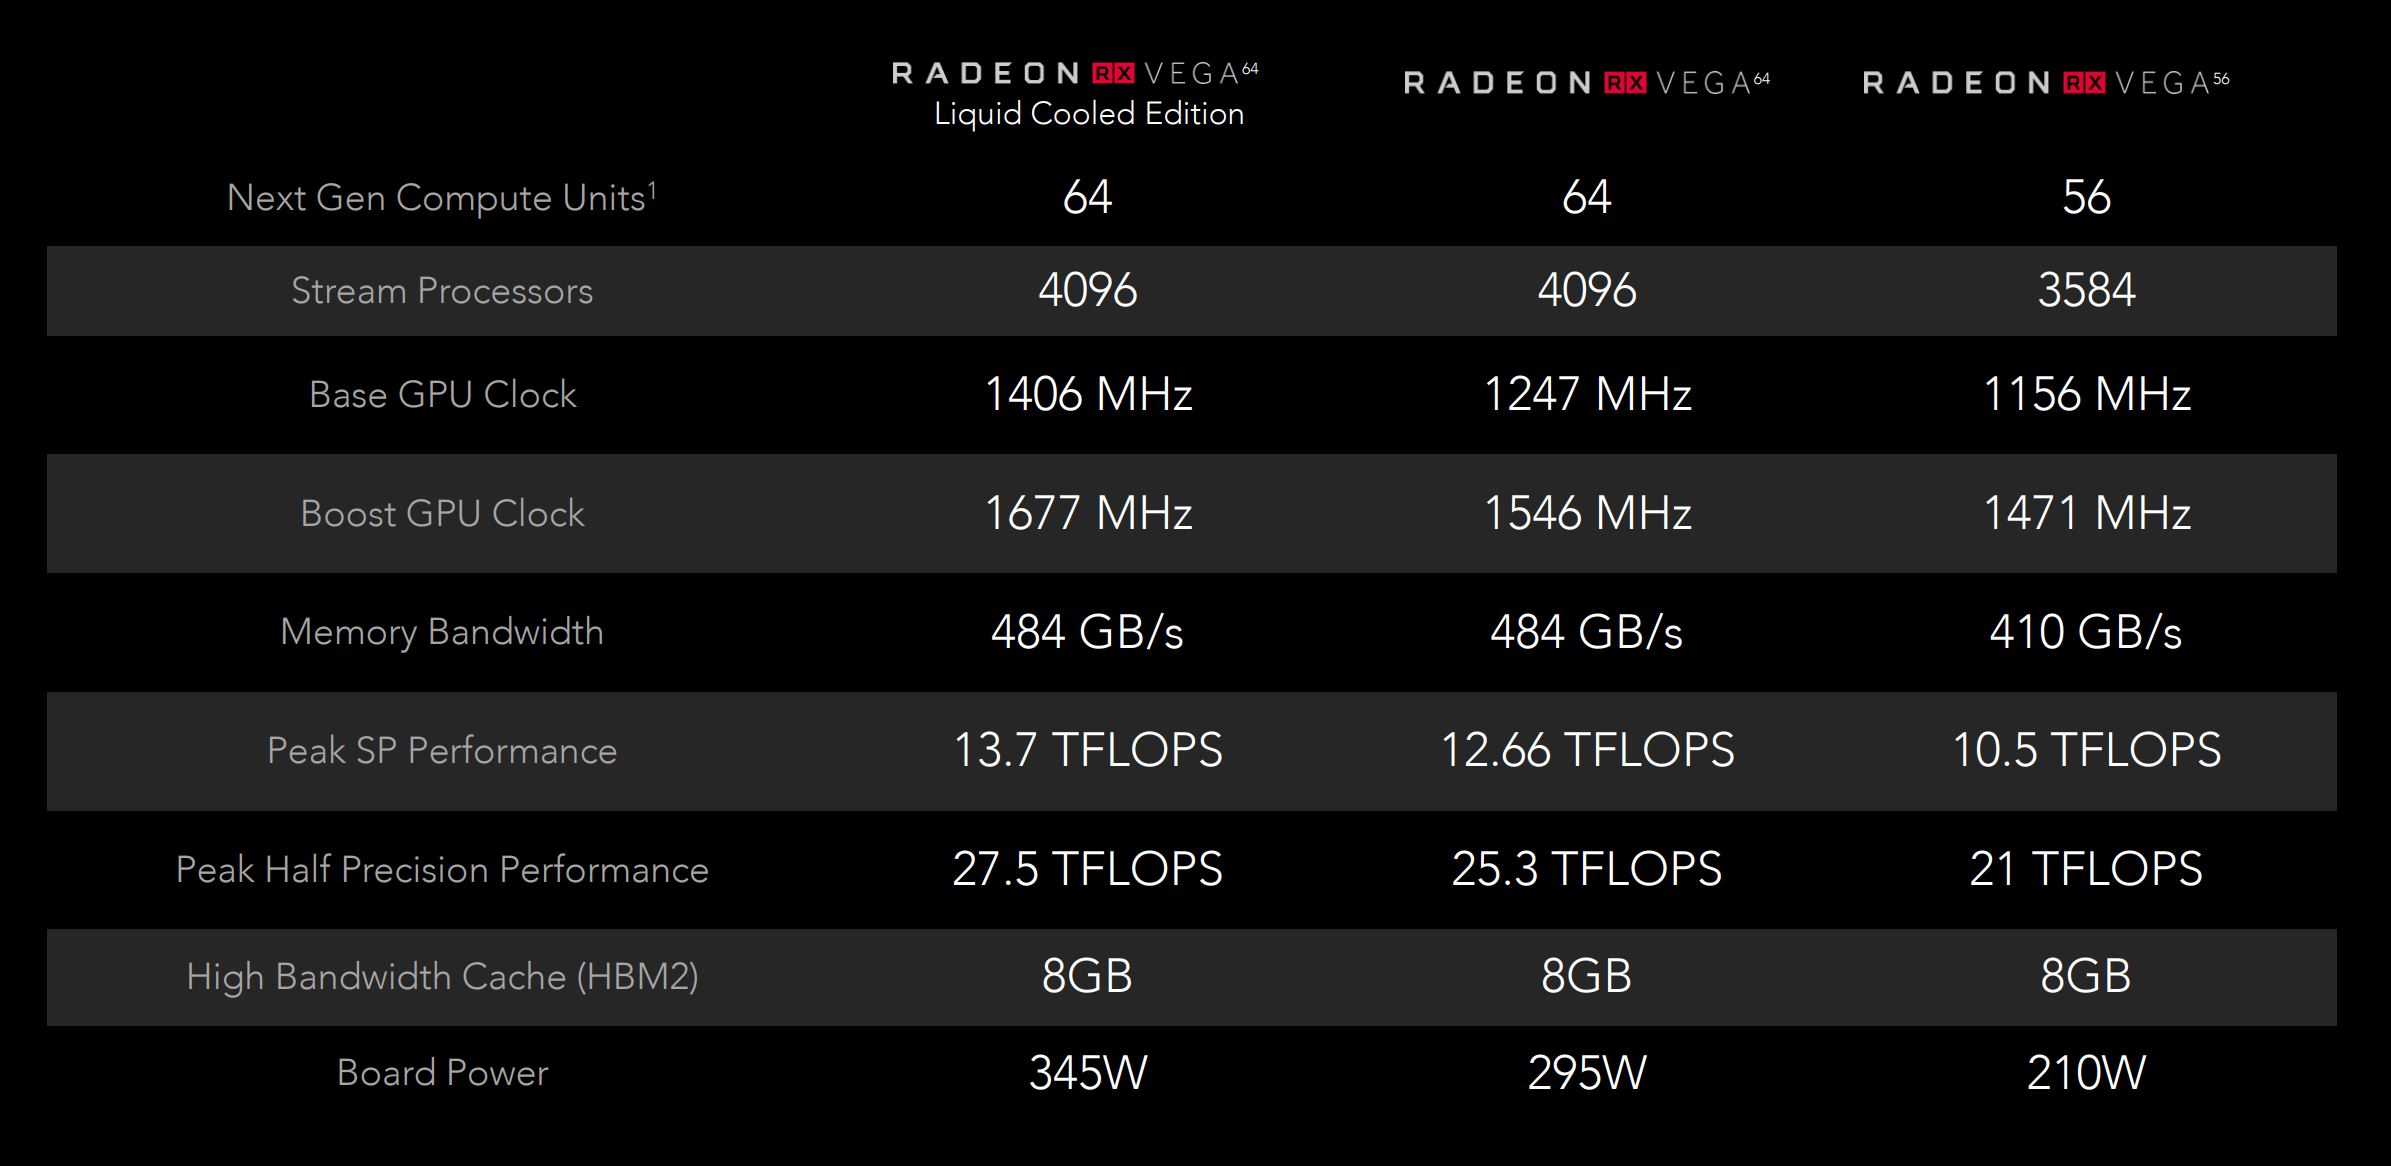 AMD Radeon RX Vega 64 & Vega 56: More To Come